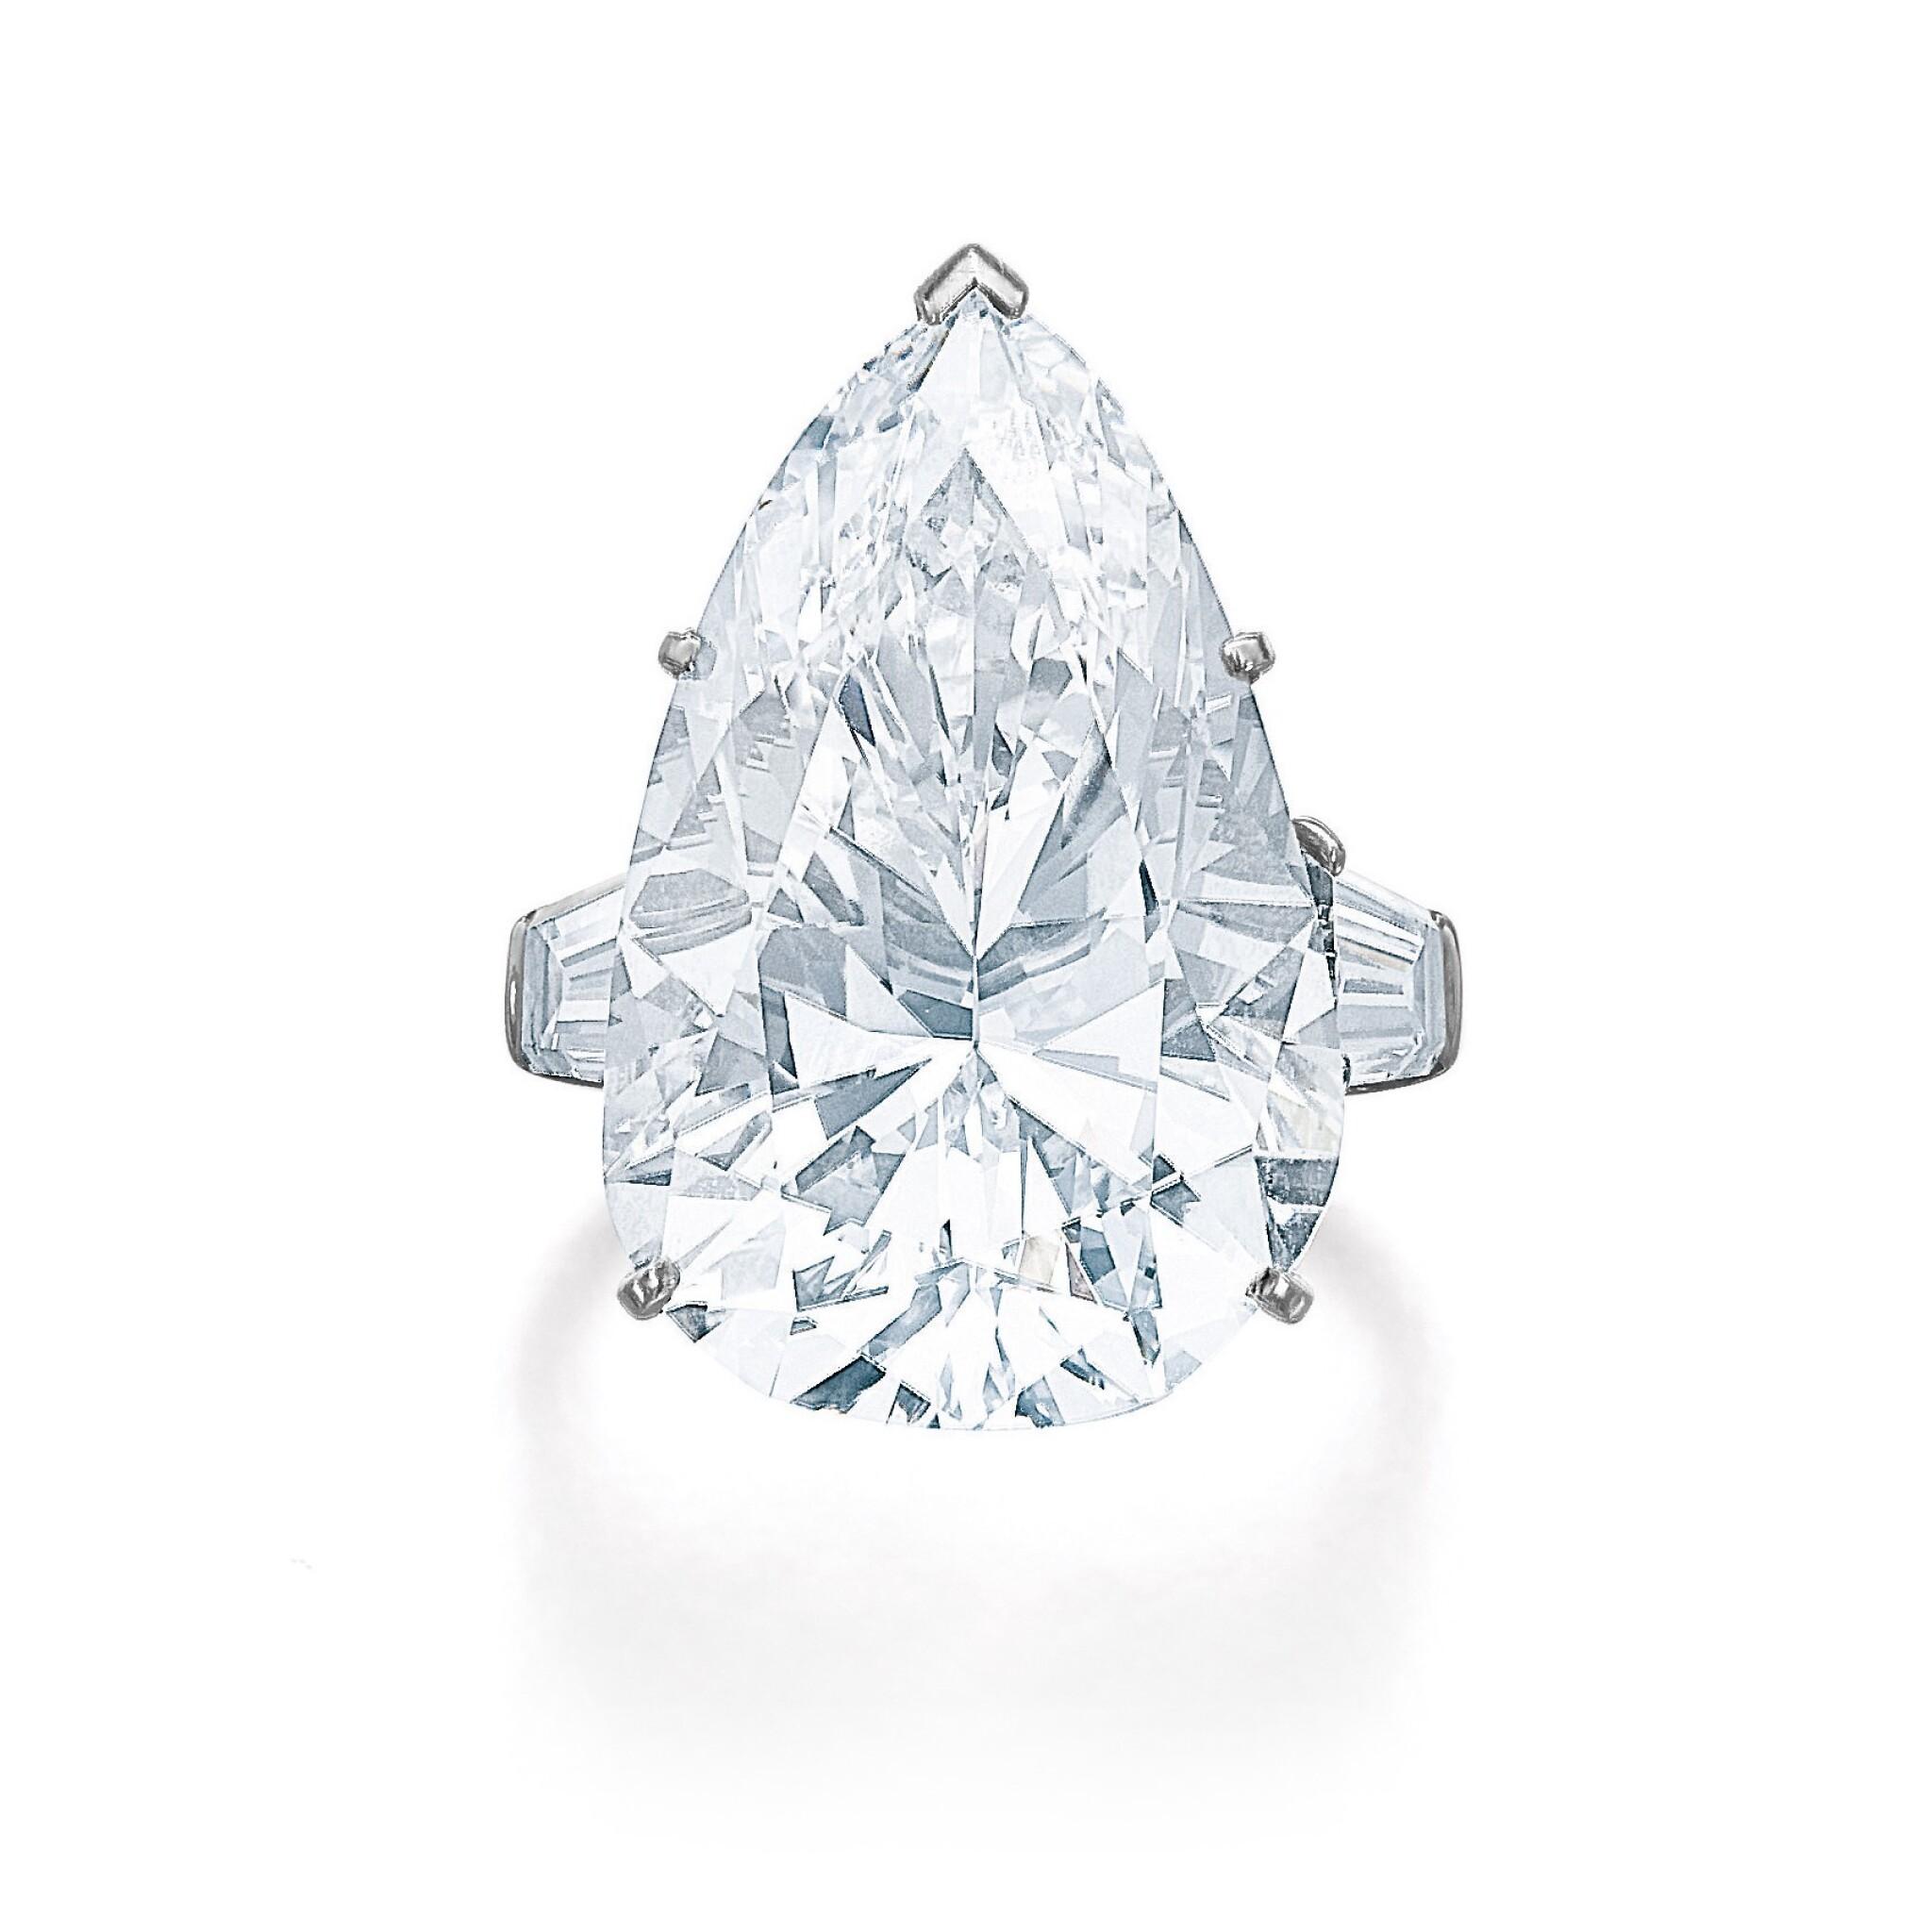 View full screen - View 1 of Lot 202. HARRY WINSTON [海瑞溫斯頓] | IMPORTANT DIAMOND RING, CIRCA 1970 [重要鑽石戒指,約1970年].